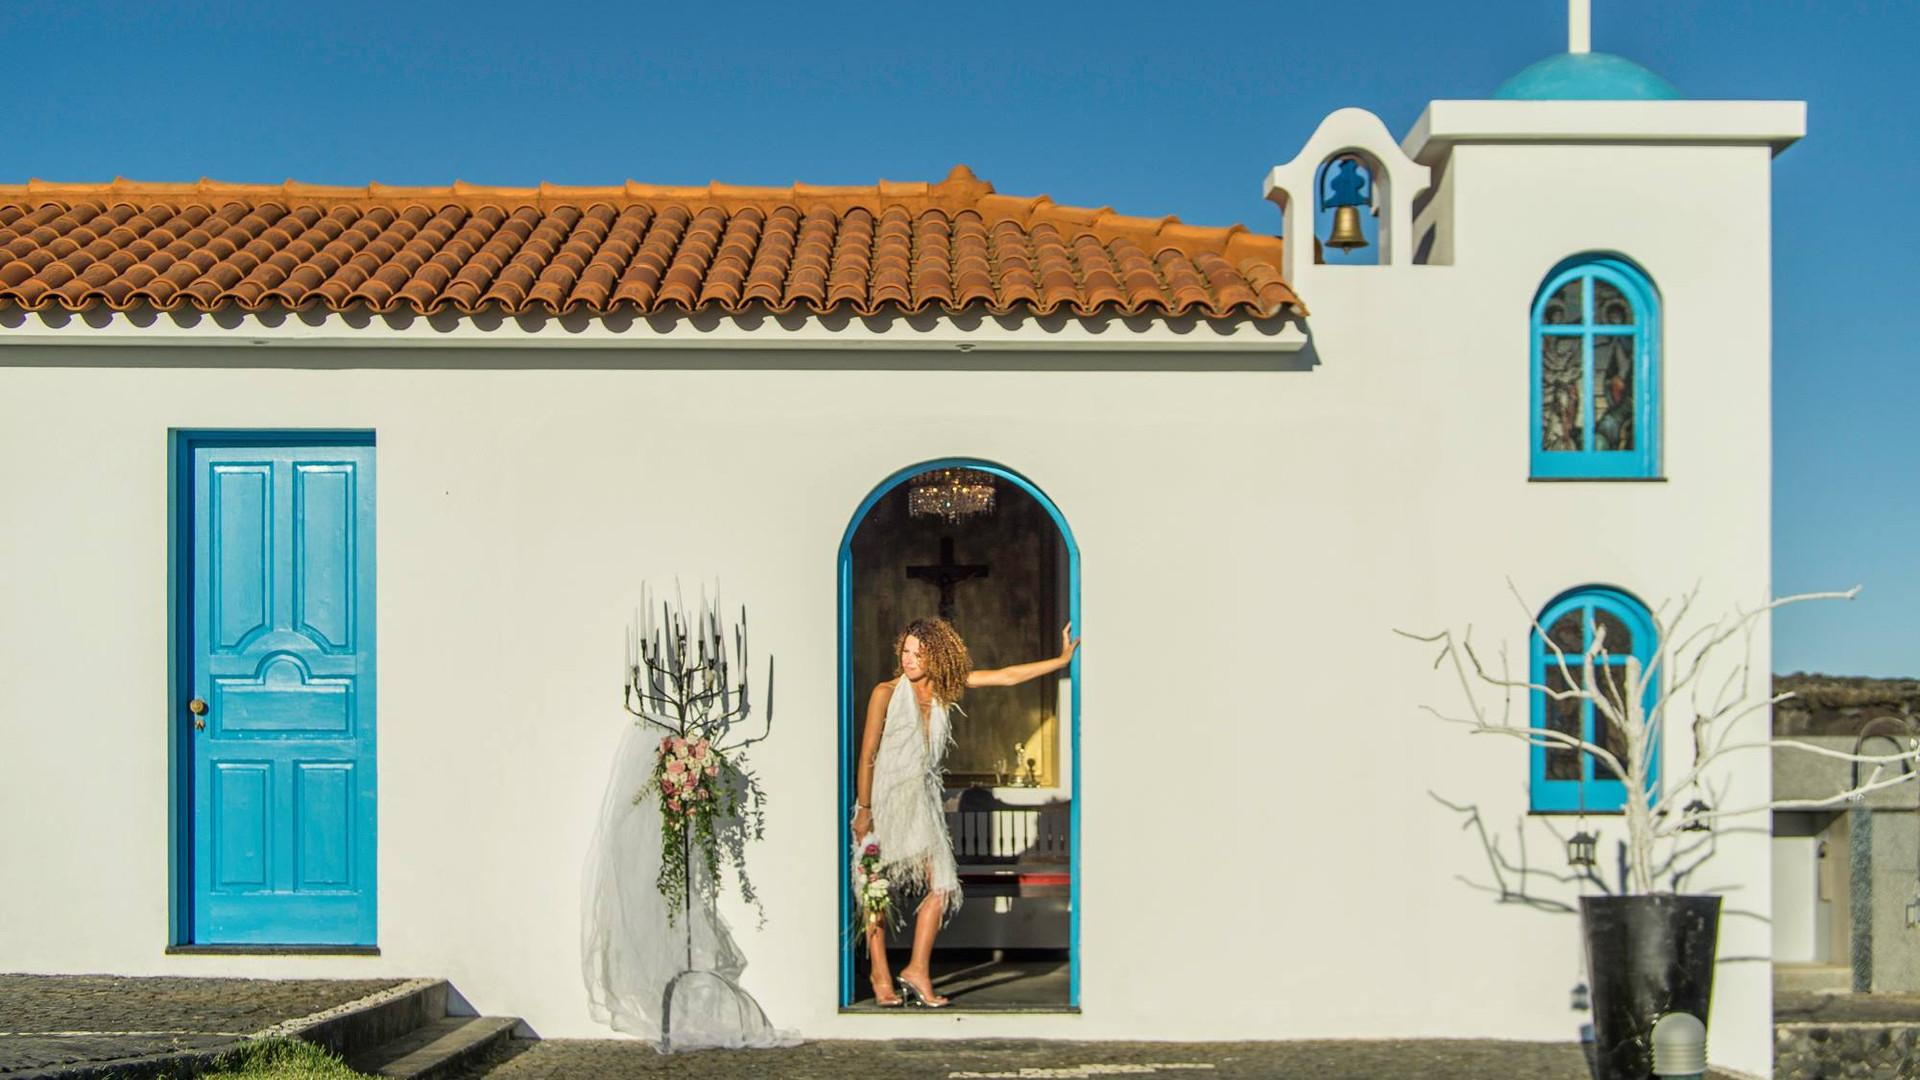 Symbolic Chapel at wedding venue in the Azores